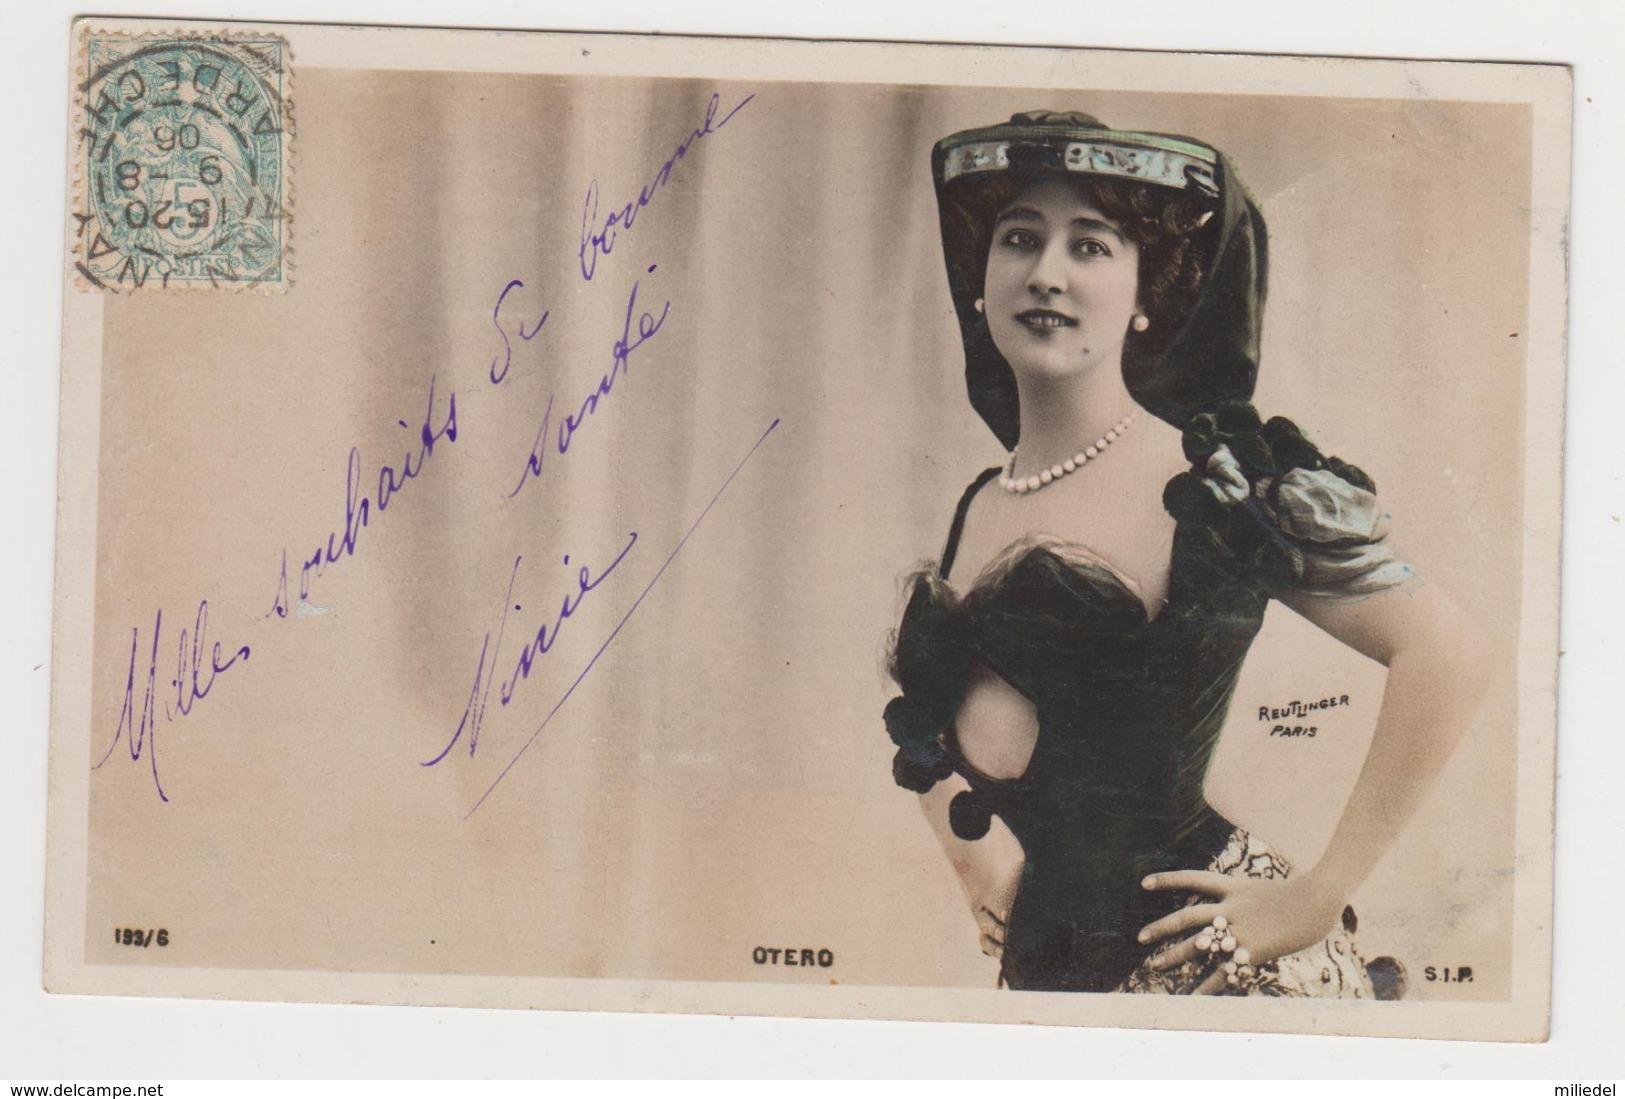 BA142 - FEMME FRAU LADY - Reutlinger Paris - OTERO - Femmes